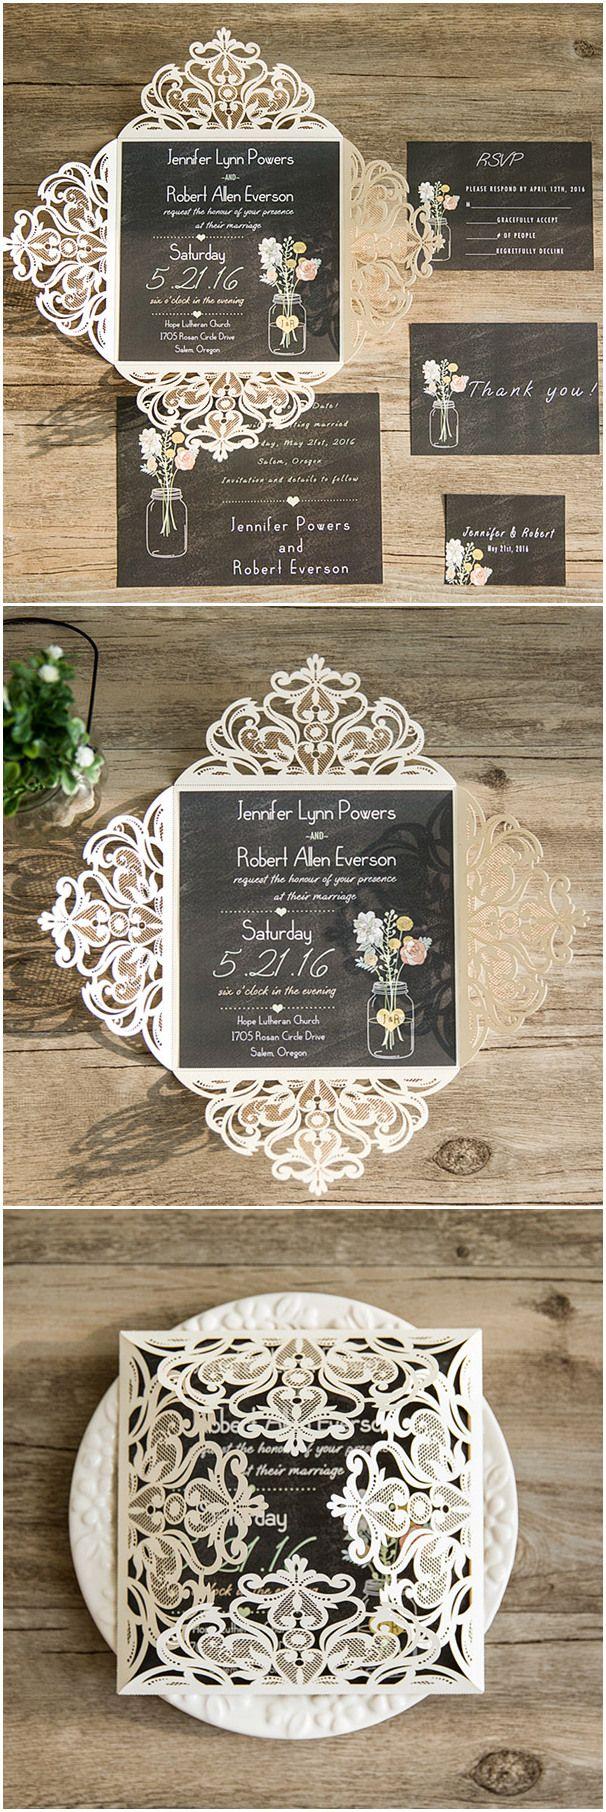 country rustic mason jars wedding invitations with laser cut pocket @elegantwinvites